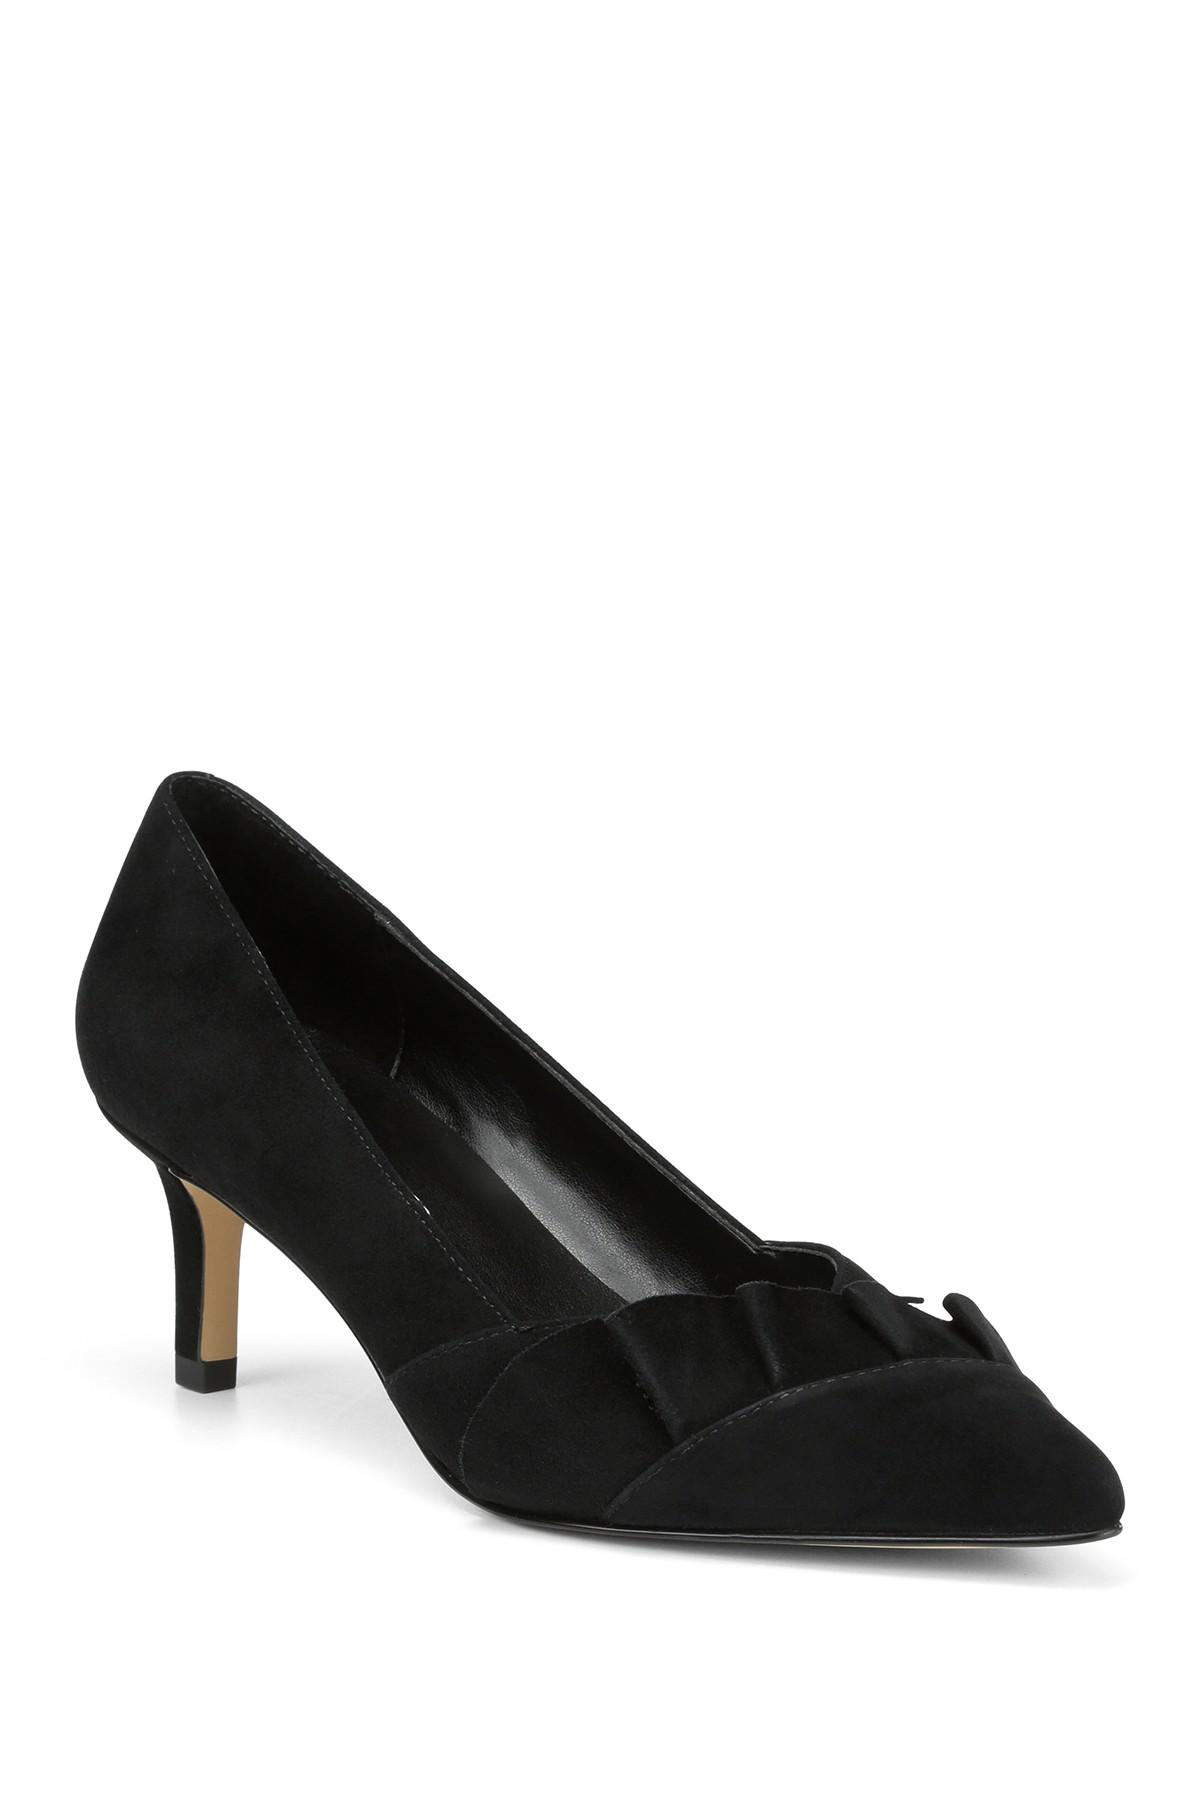 27c8936acd Lyst - Donald J Pliner Fayer Kitten Heel Pump in Black